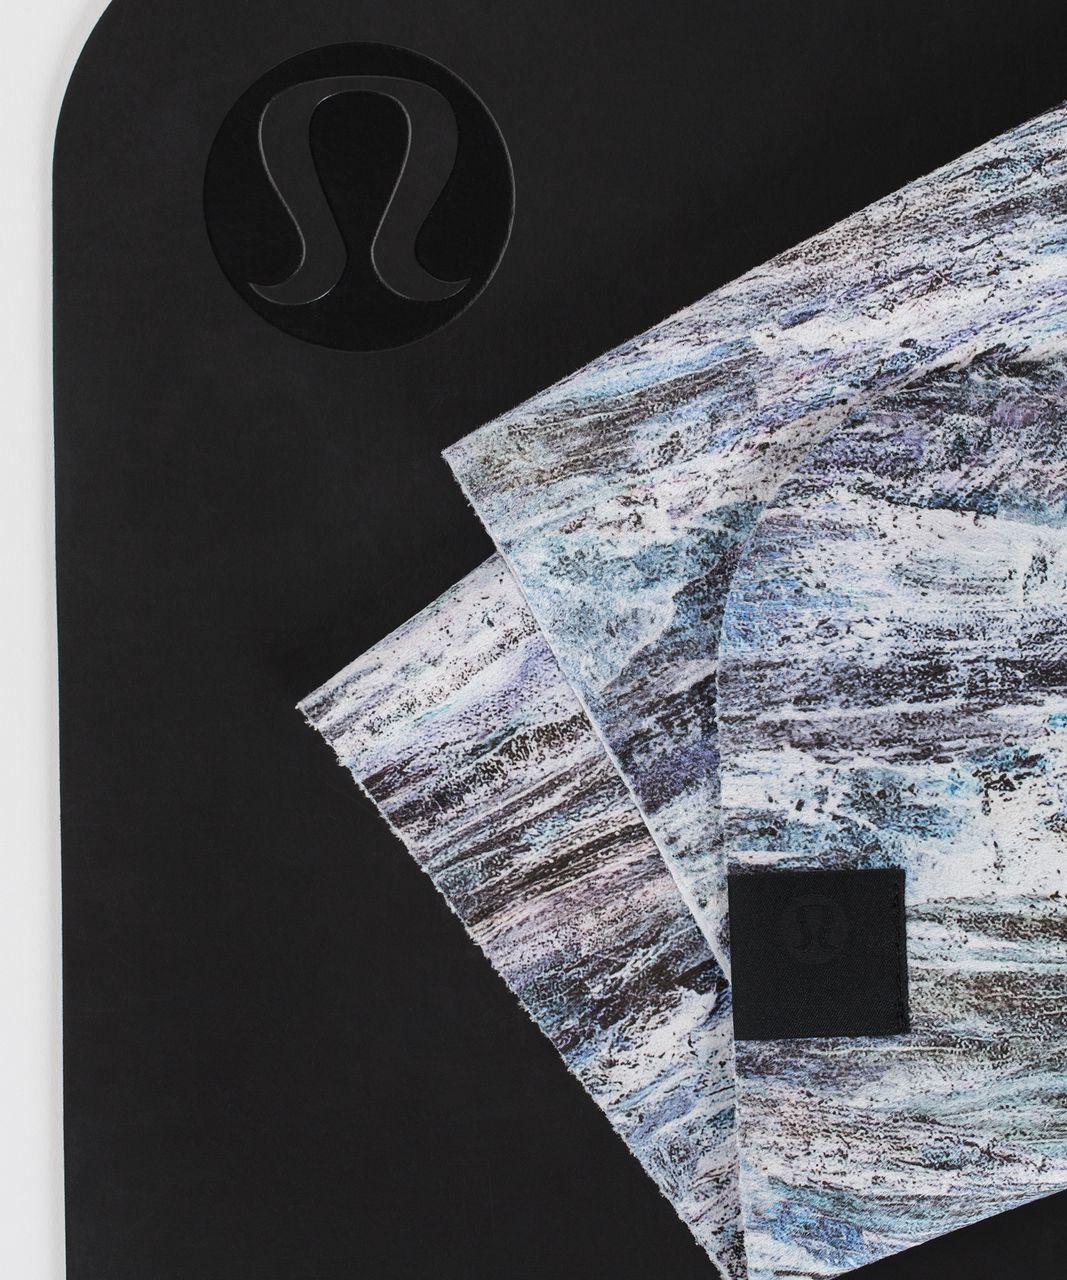 Lululemon The (Small) Towel - The Towel Maxi Aerial Drift